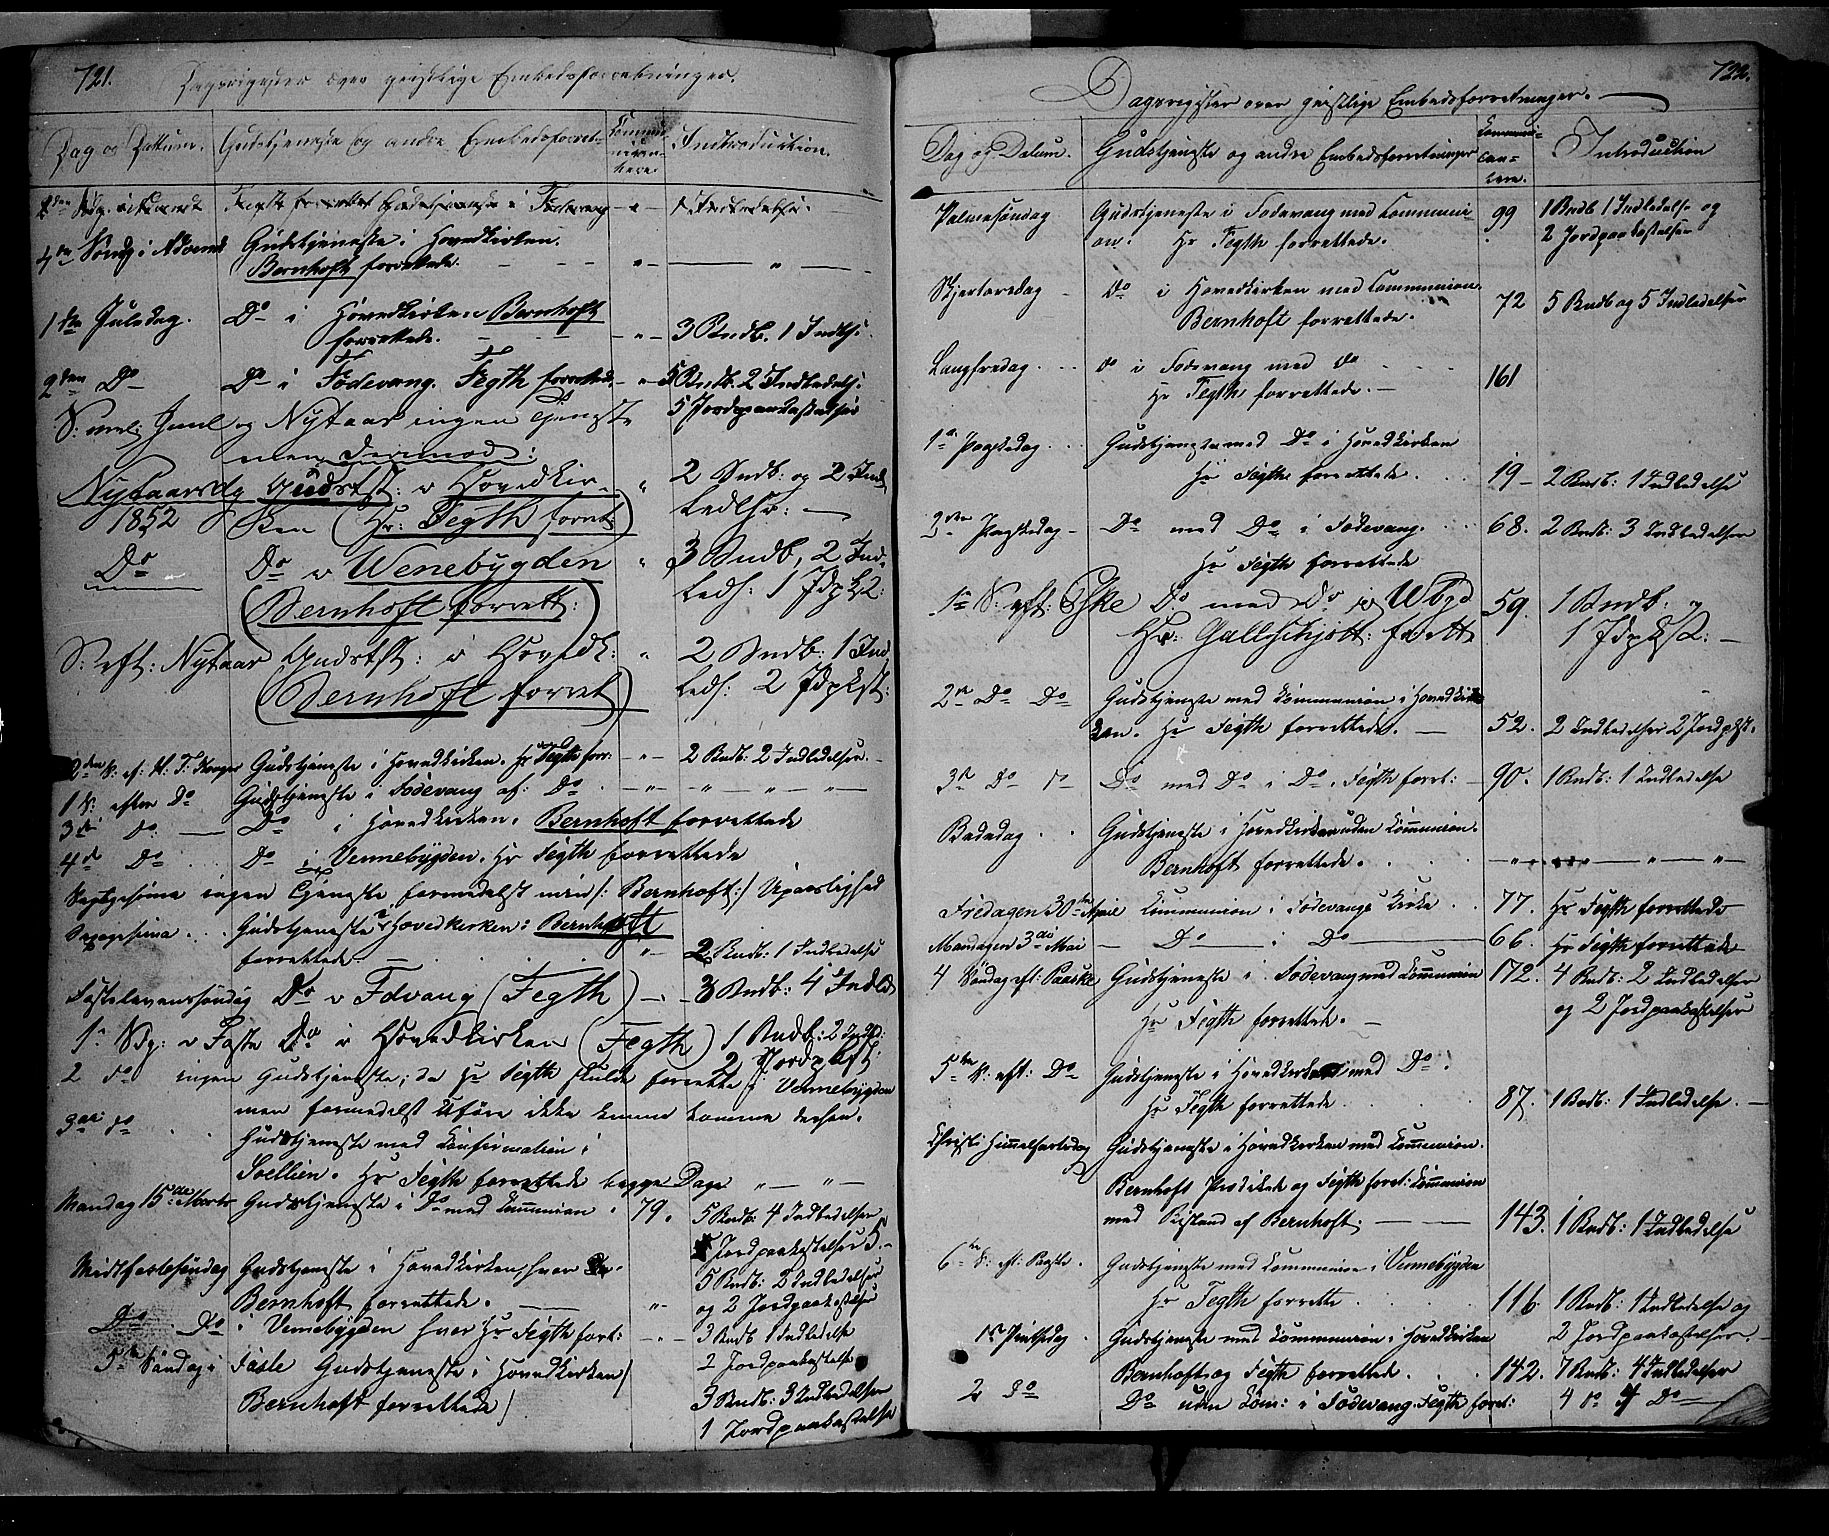 SAH, Ringebu prestekontor, Ministerialbok nr. 6, 1848-1859, s. 721-722